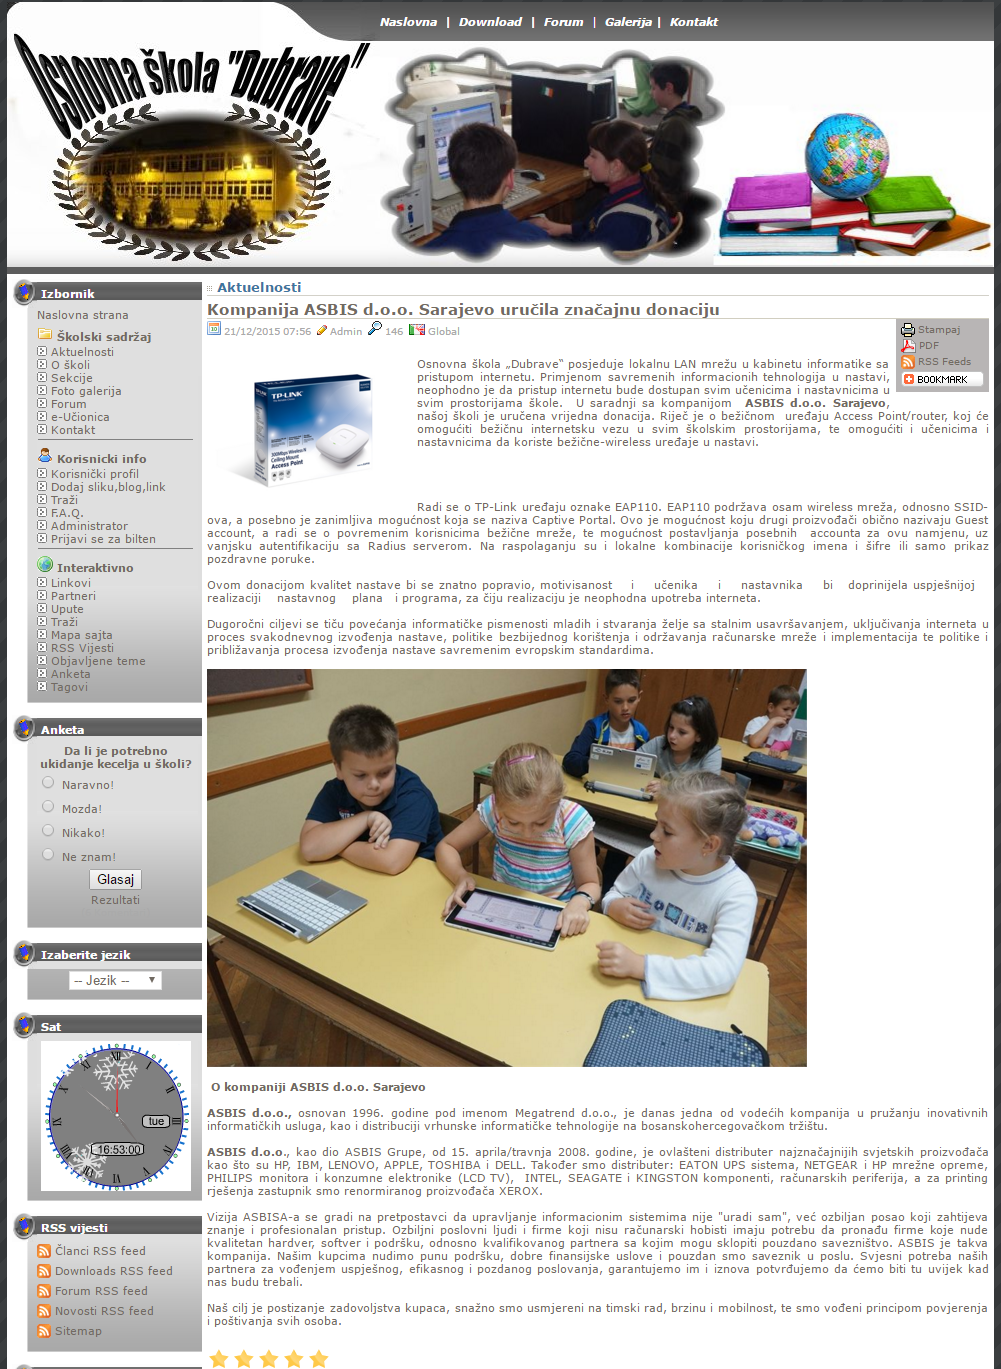 ASBIS makes donation to elementary school in Sarajevo